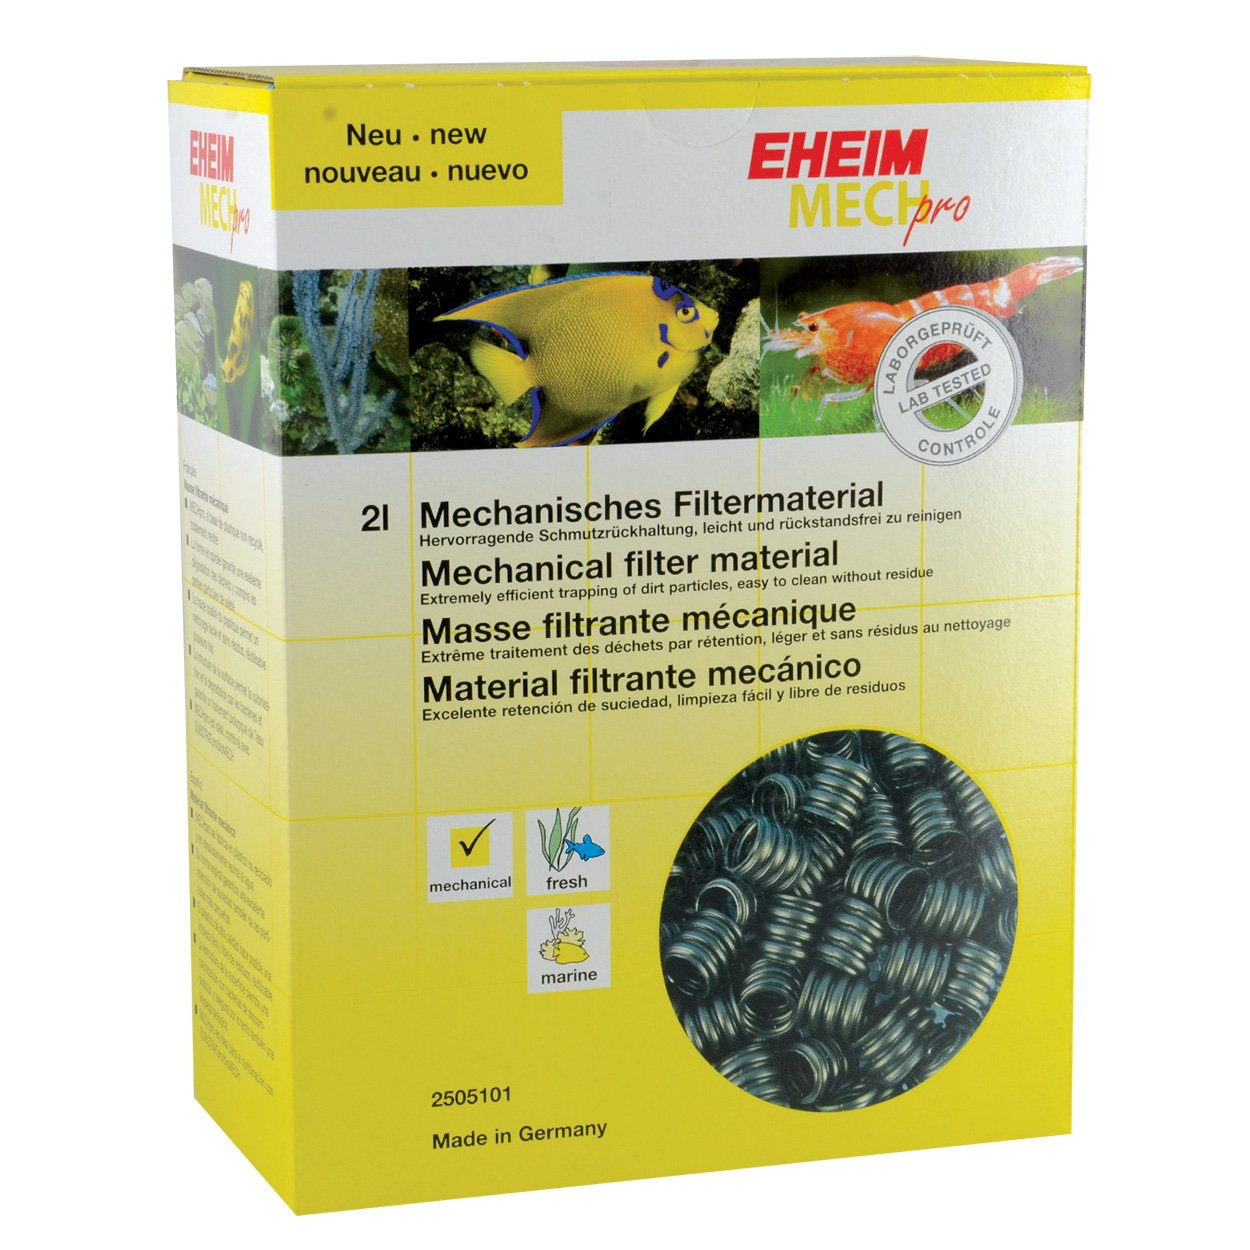 Eheim 6681 Mechpro, 2 L